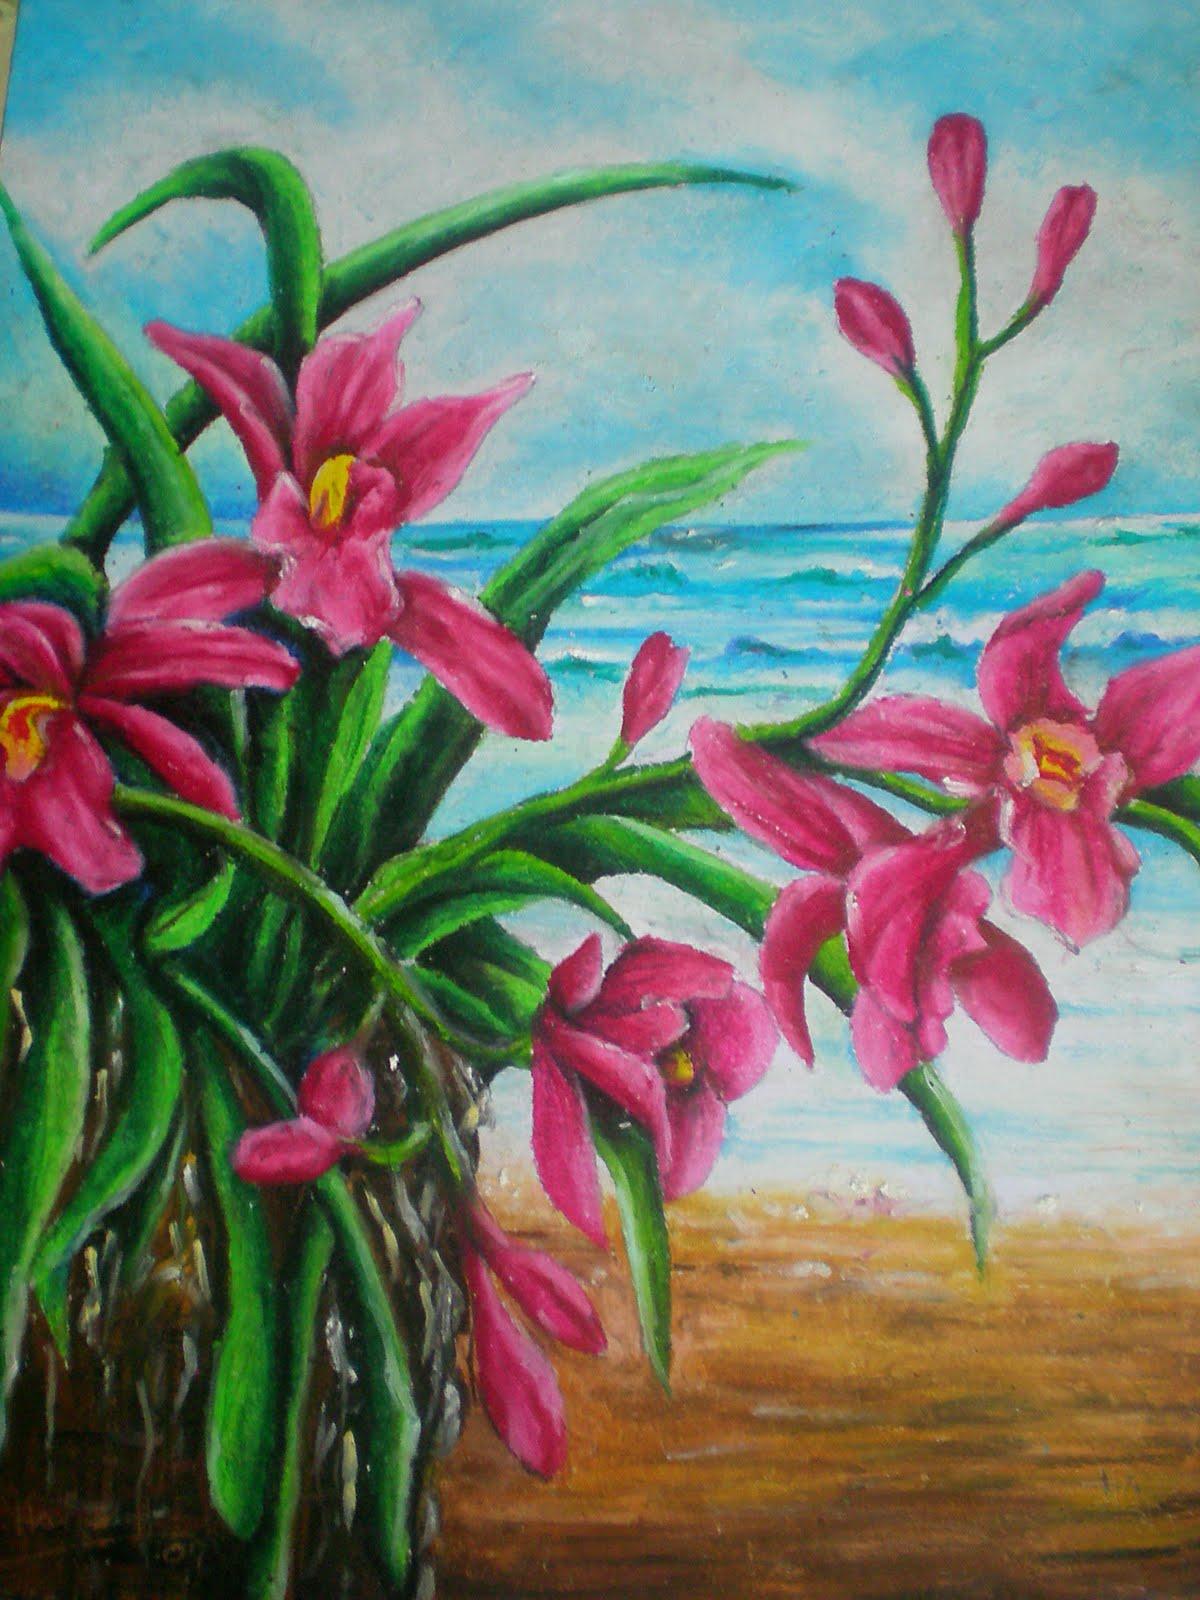 Gambar Bunga Orkid Paling Cantik » Greatnesia